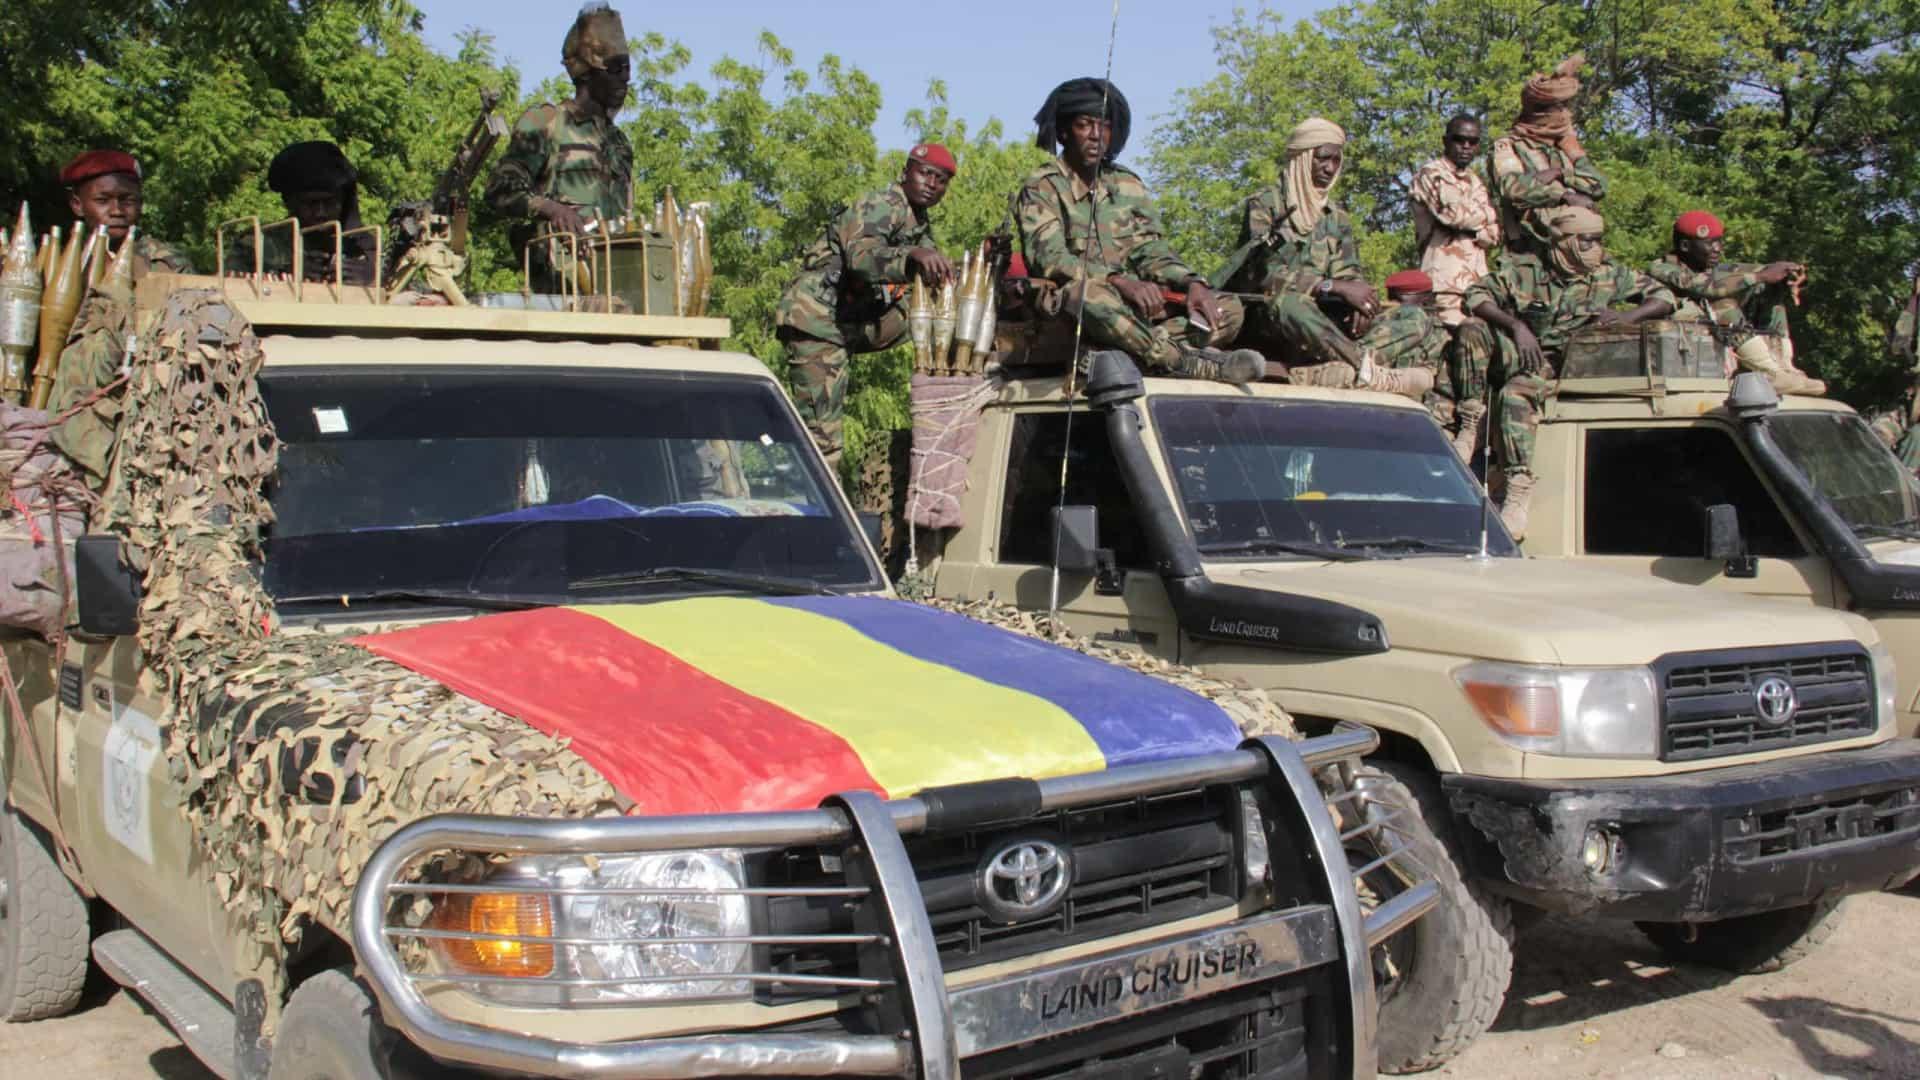 Militares do Chade afirmam ter 'derrotado rebeldes' após morte de Déby